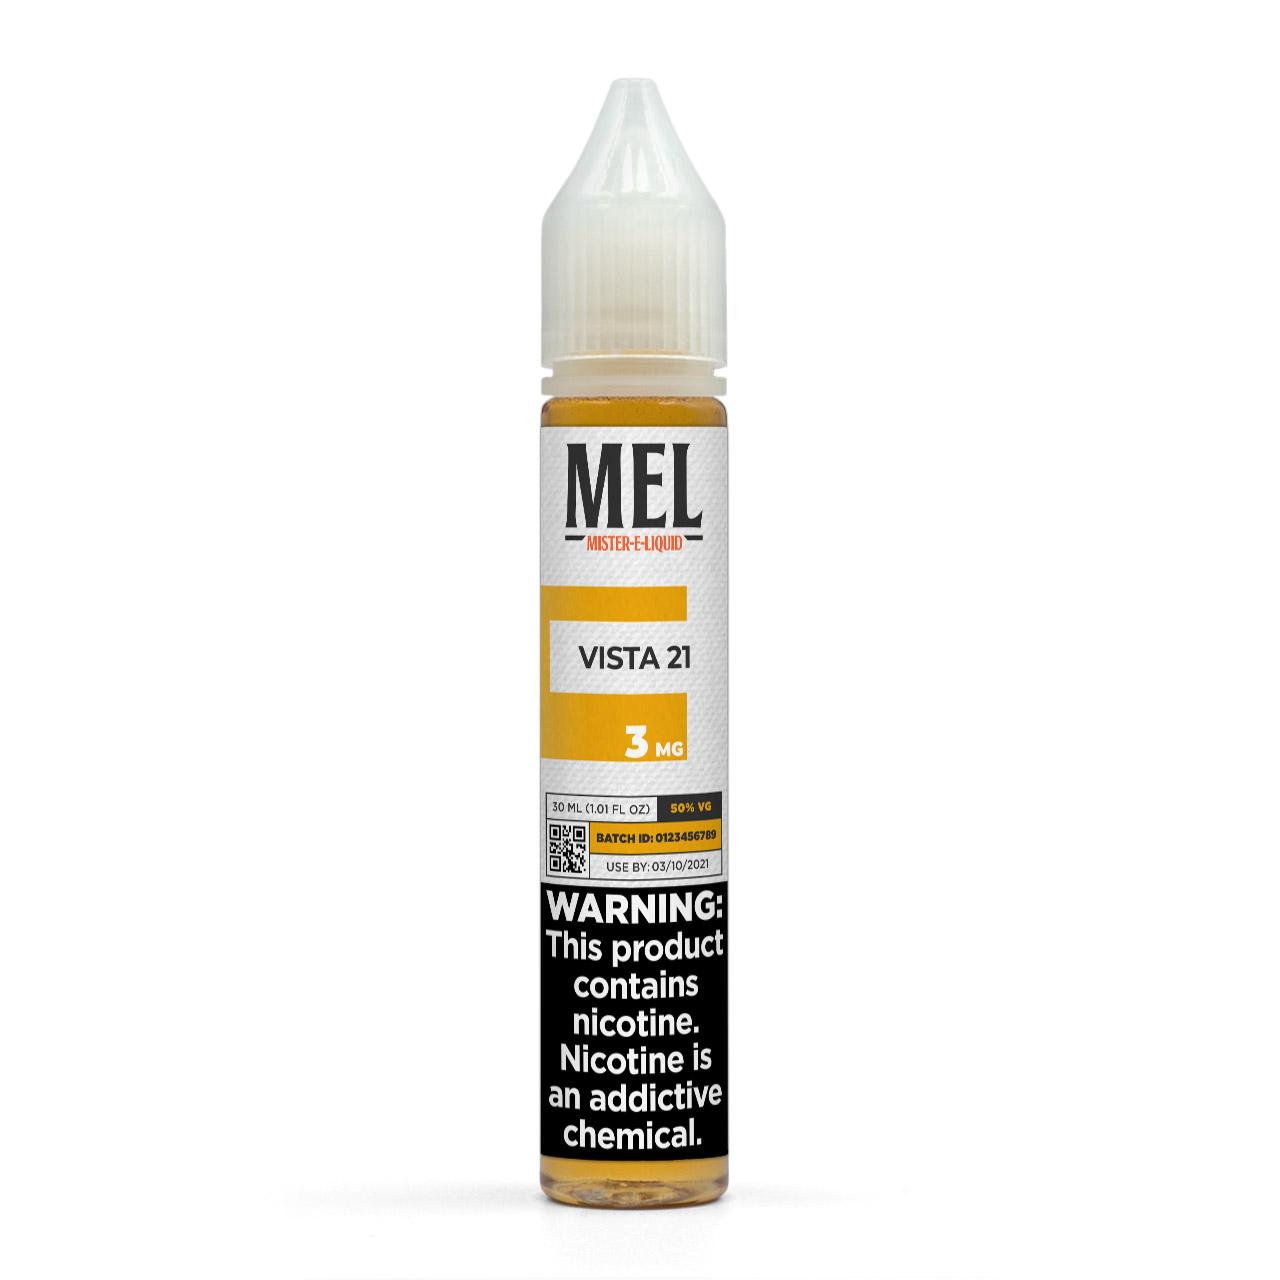 MEL Vista 21 Vape Juice, 3 mg